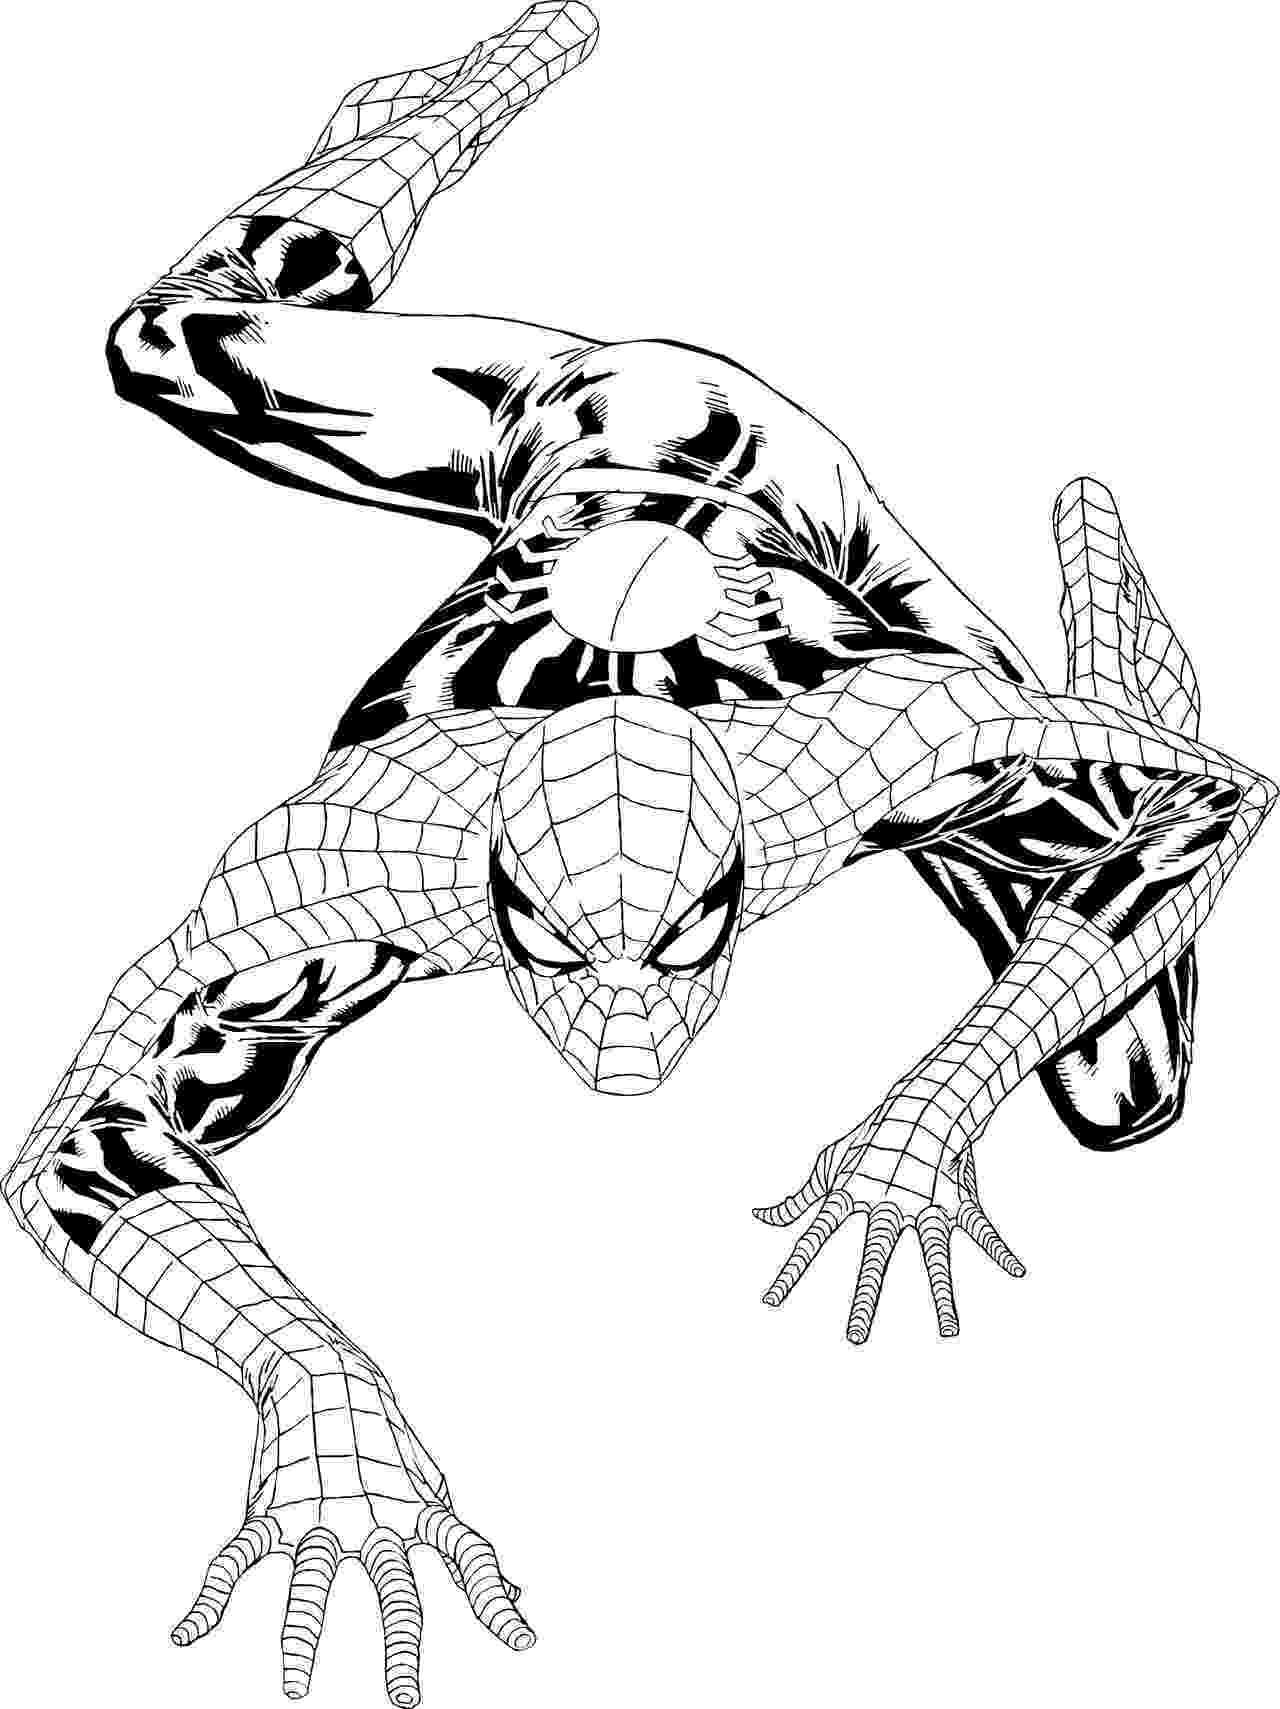 spiderman coloring books spiderman coloring pages free large images coloring coloring spiderman books